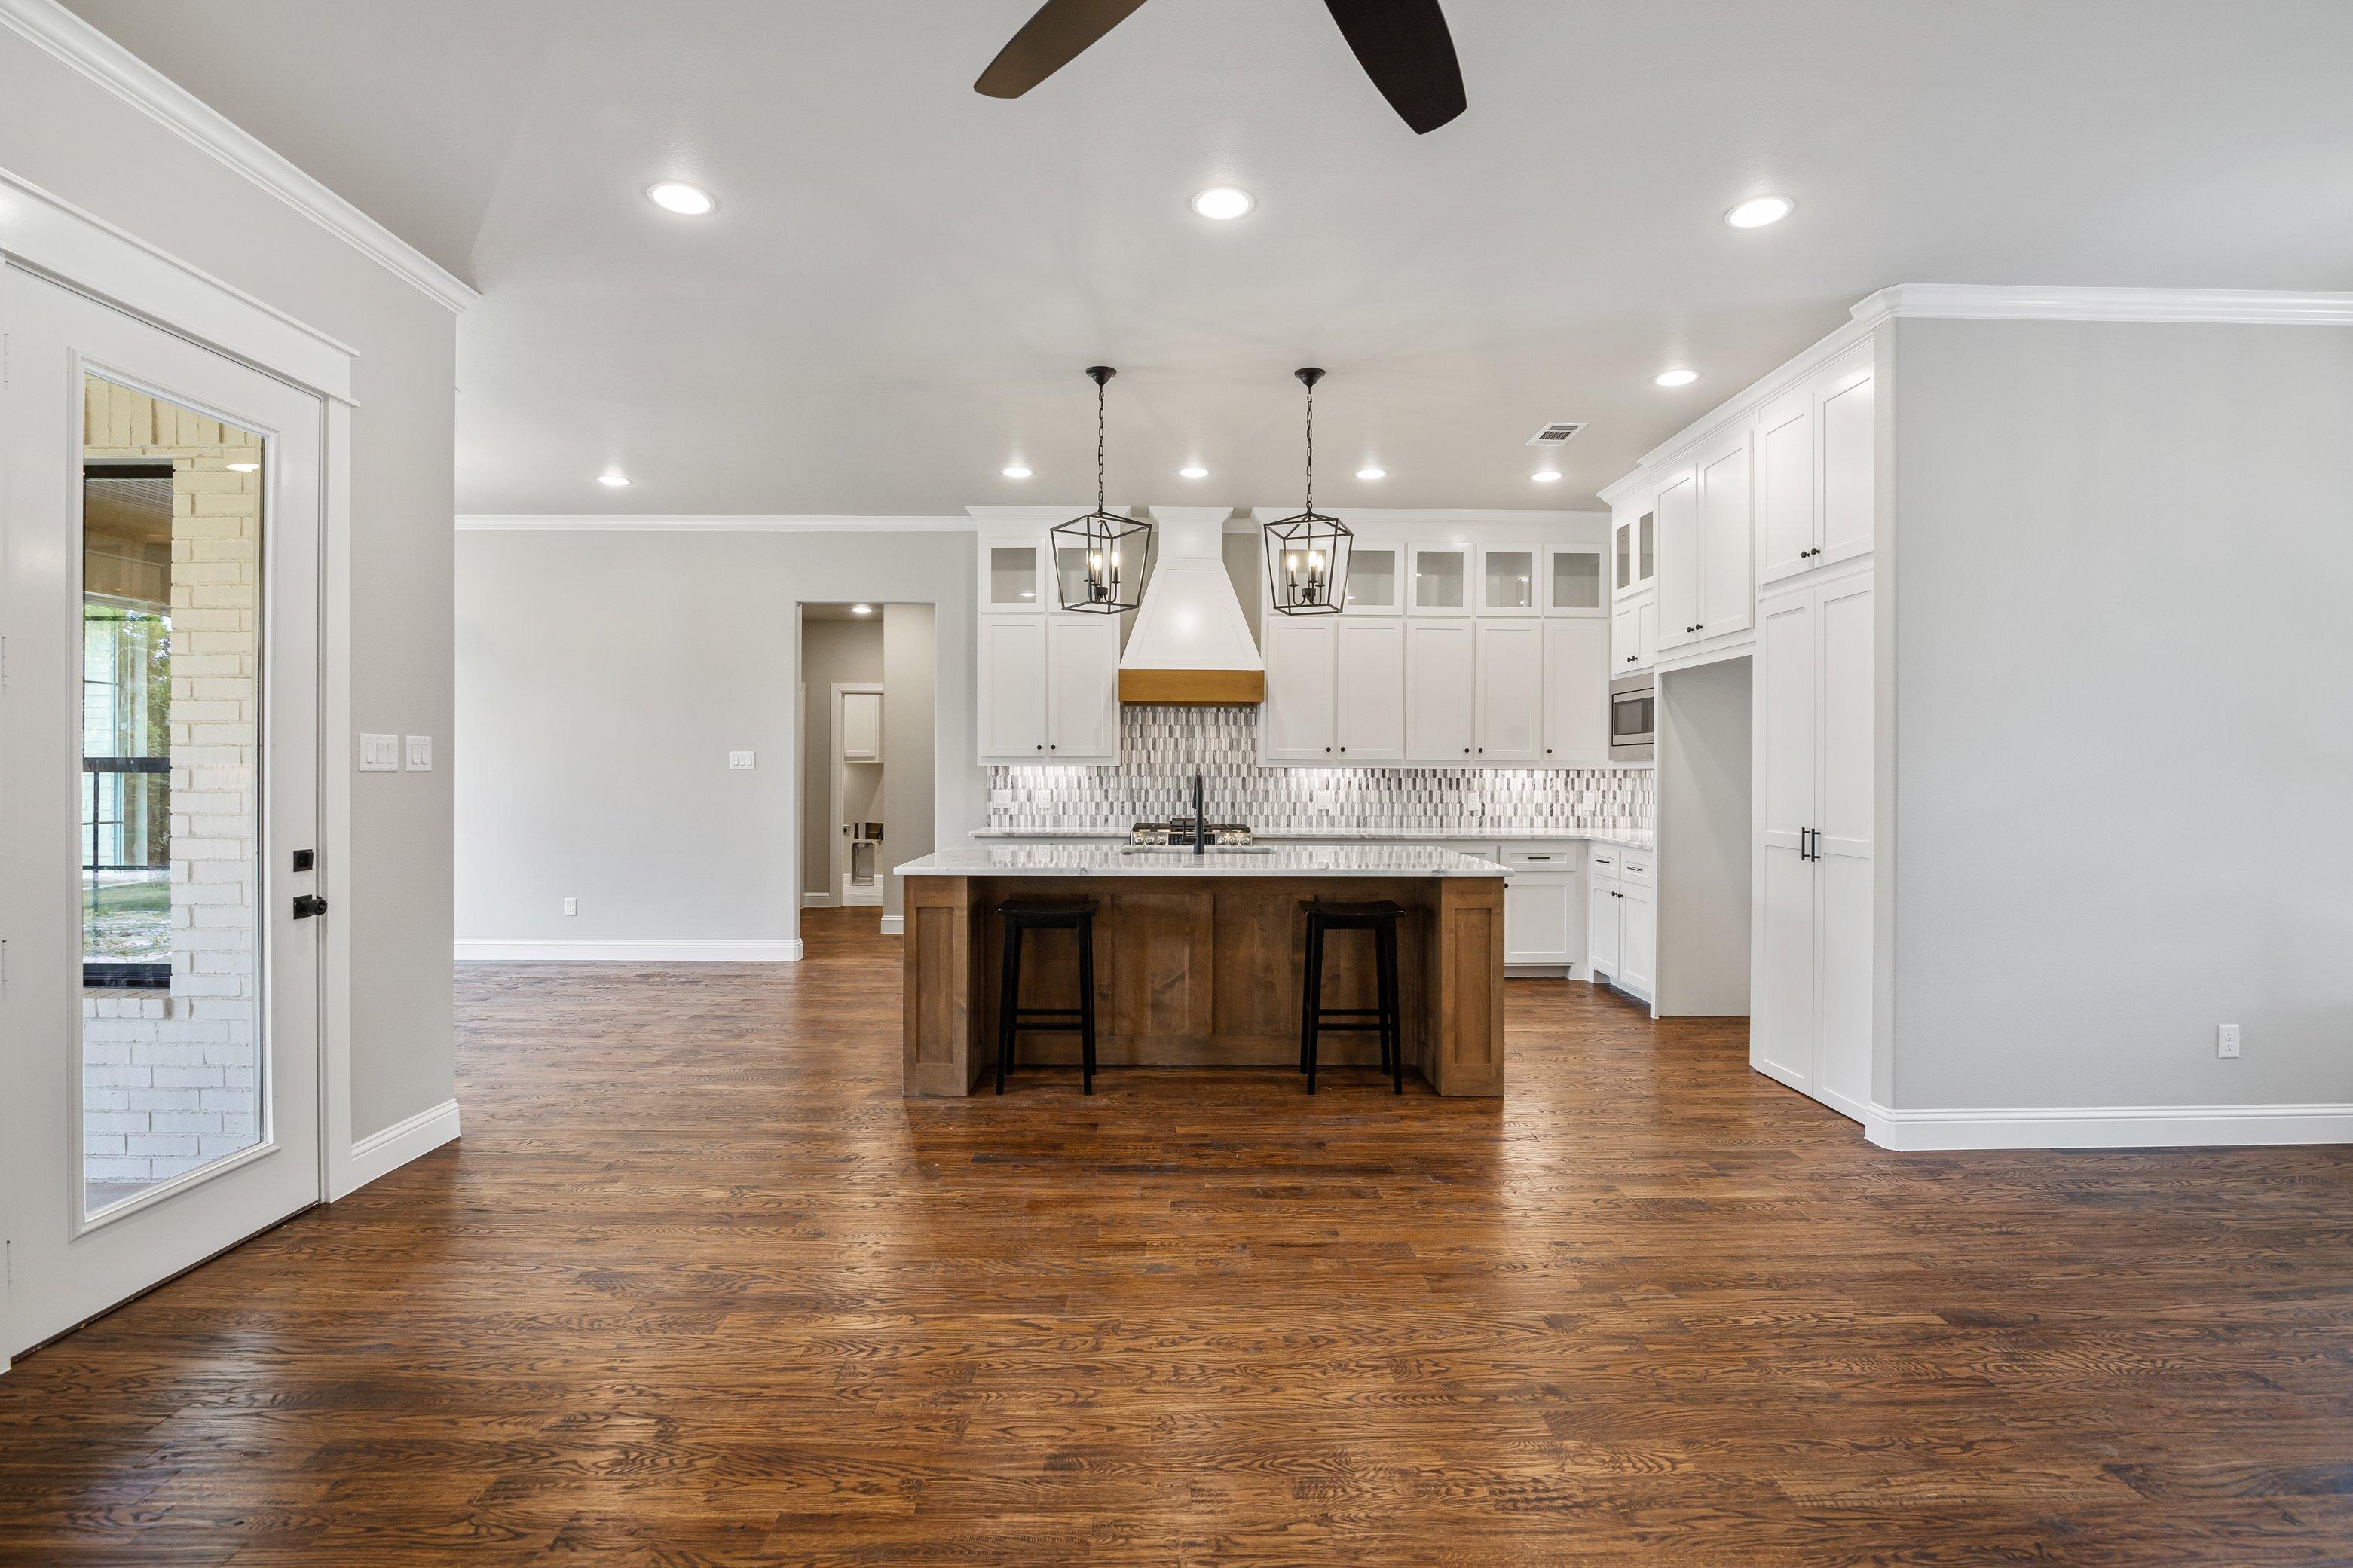 https://0201.nccdn.net/4_2/000/000/01e/20c/living-to-kitchen-view.jpg